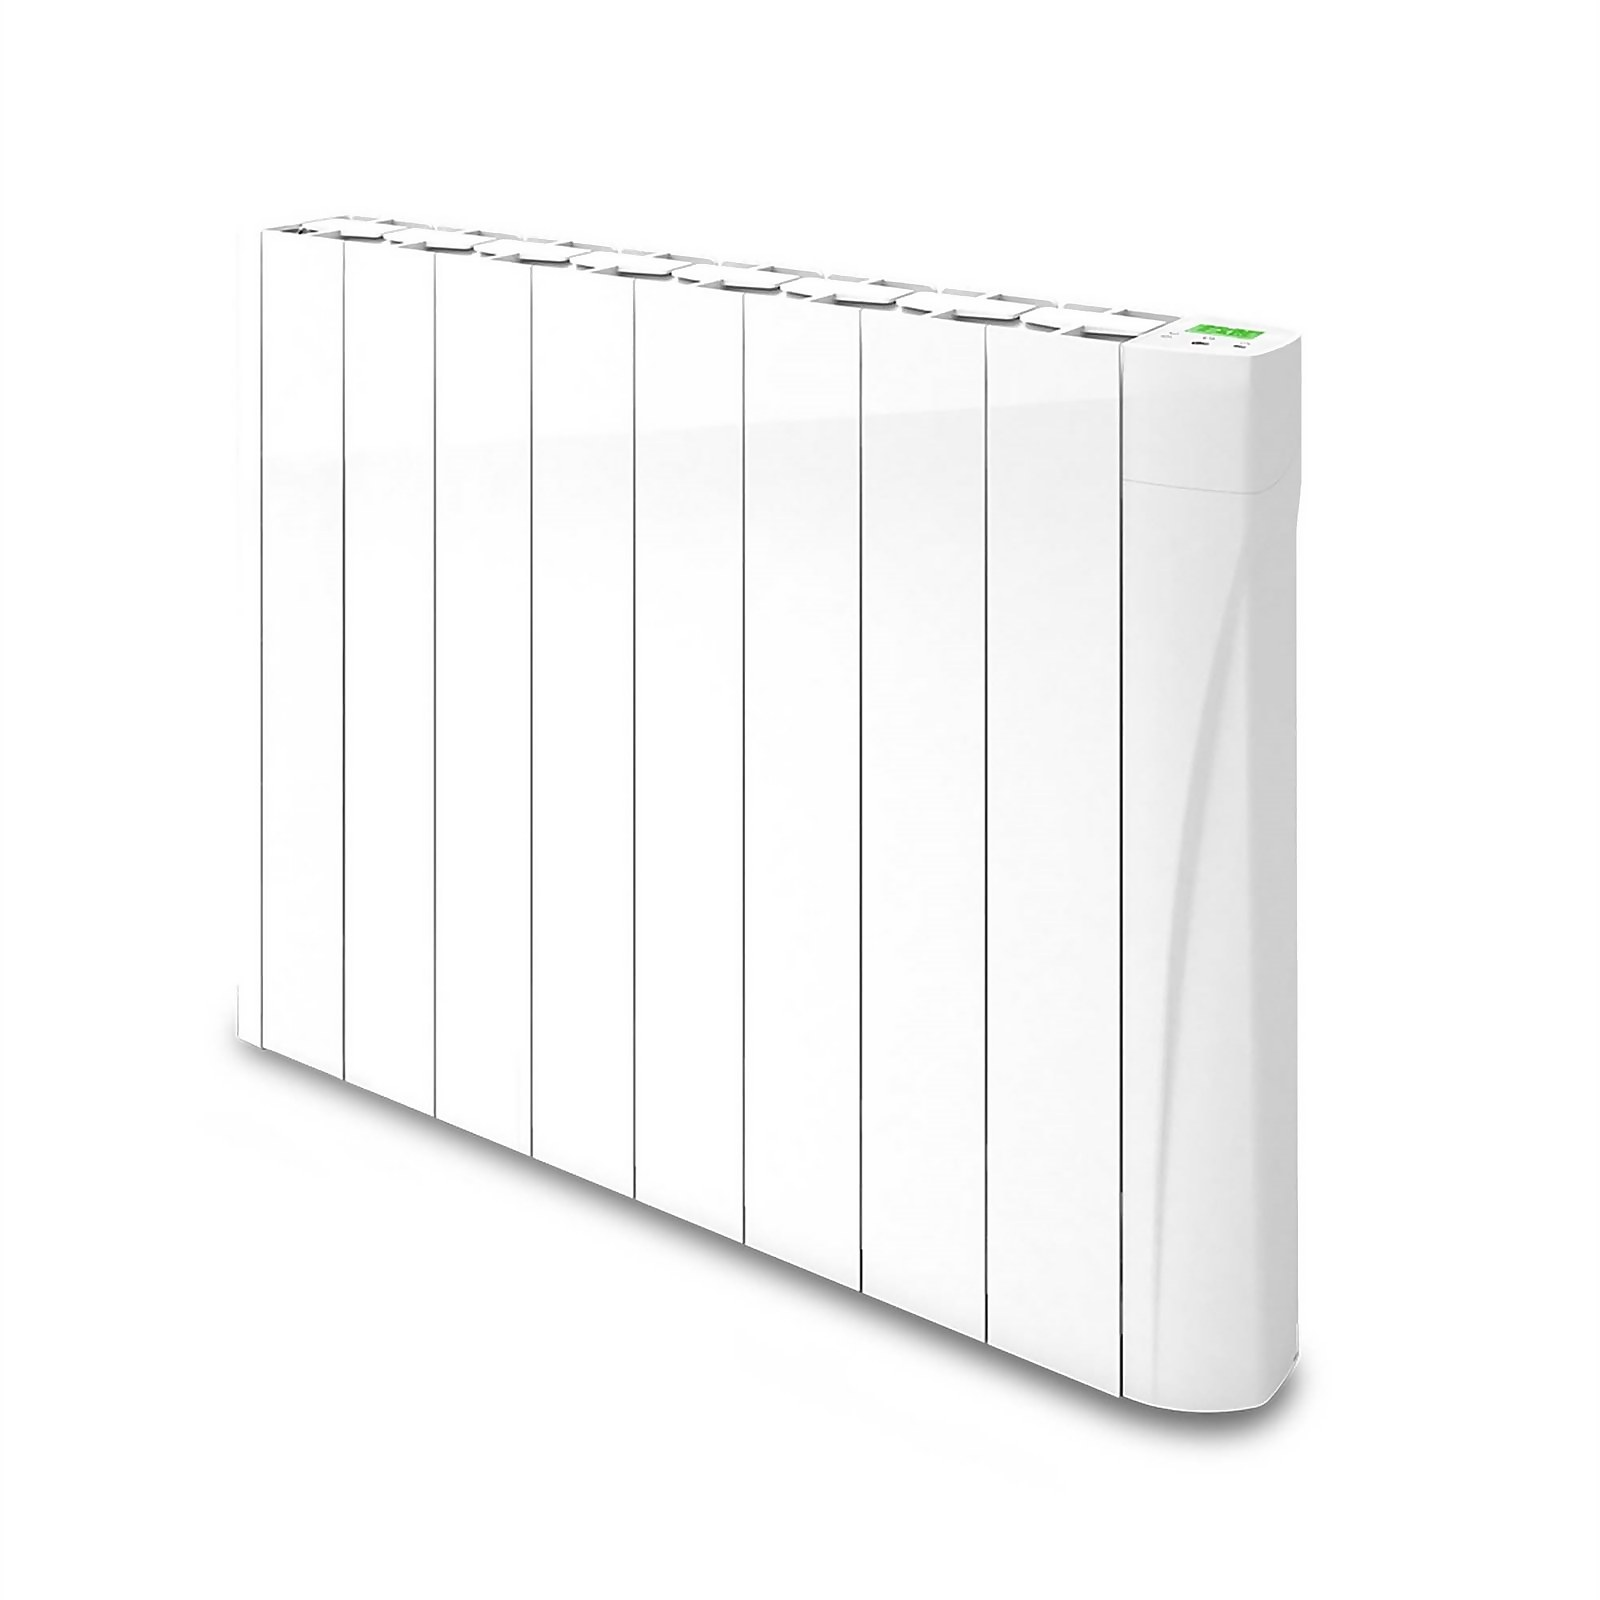 TCP Wall Mounted Smart Wi-Fi Oil Filled Radiator 1000W - White